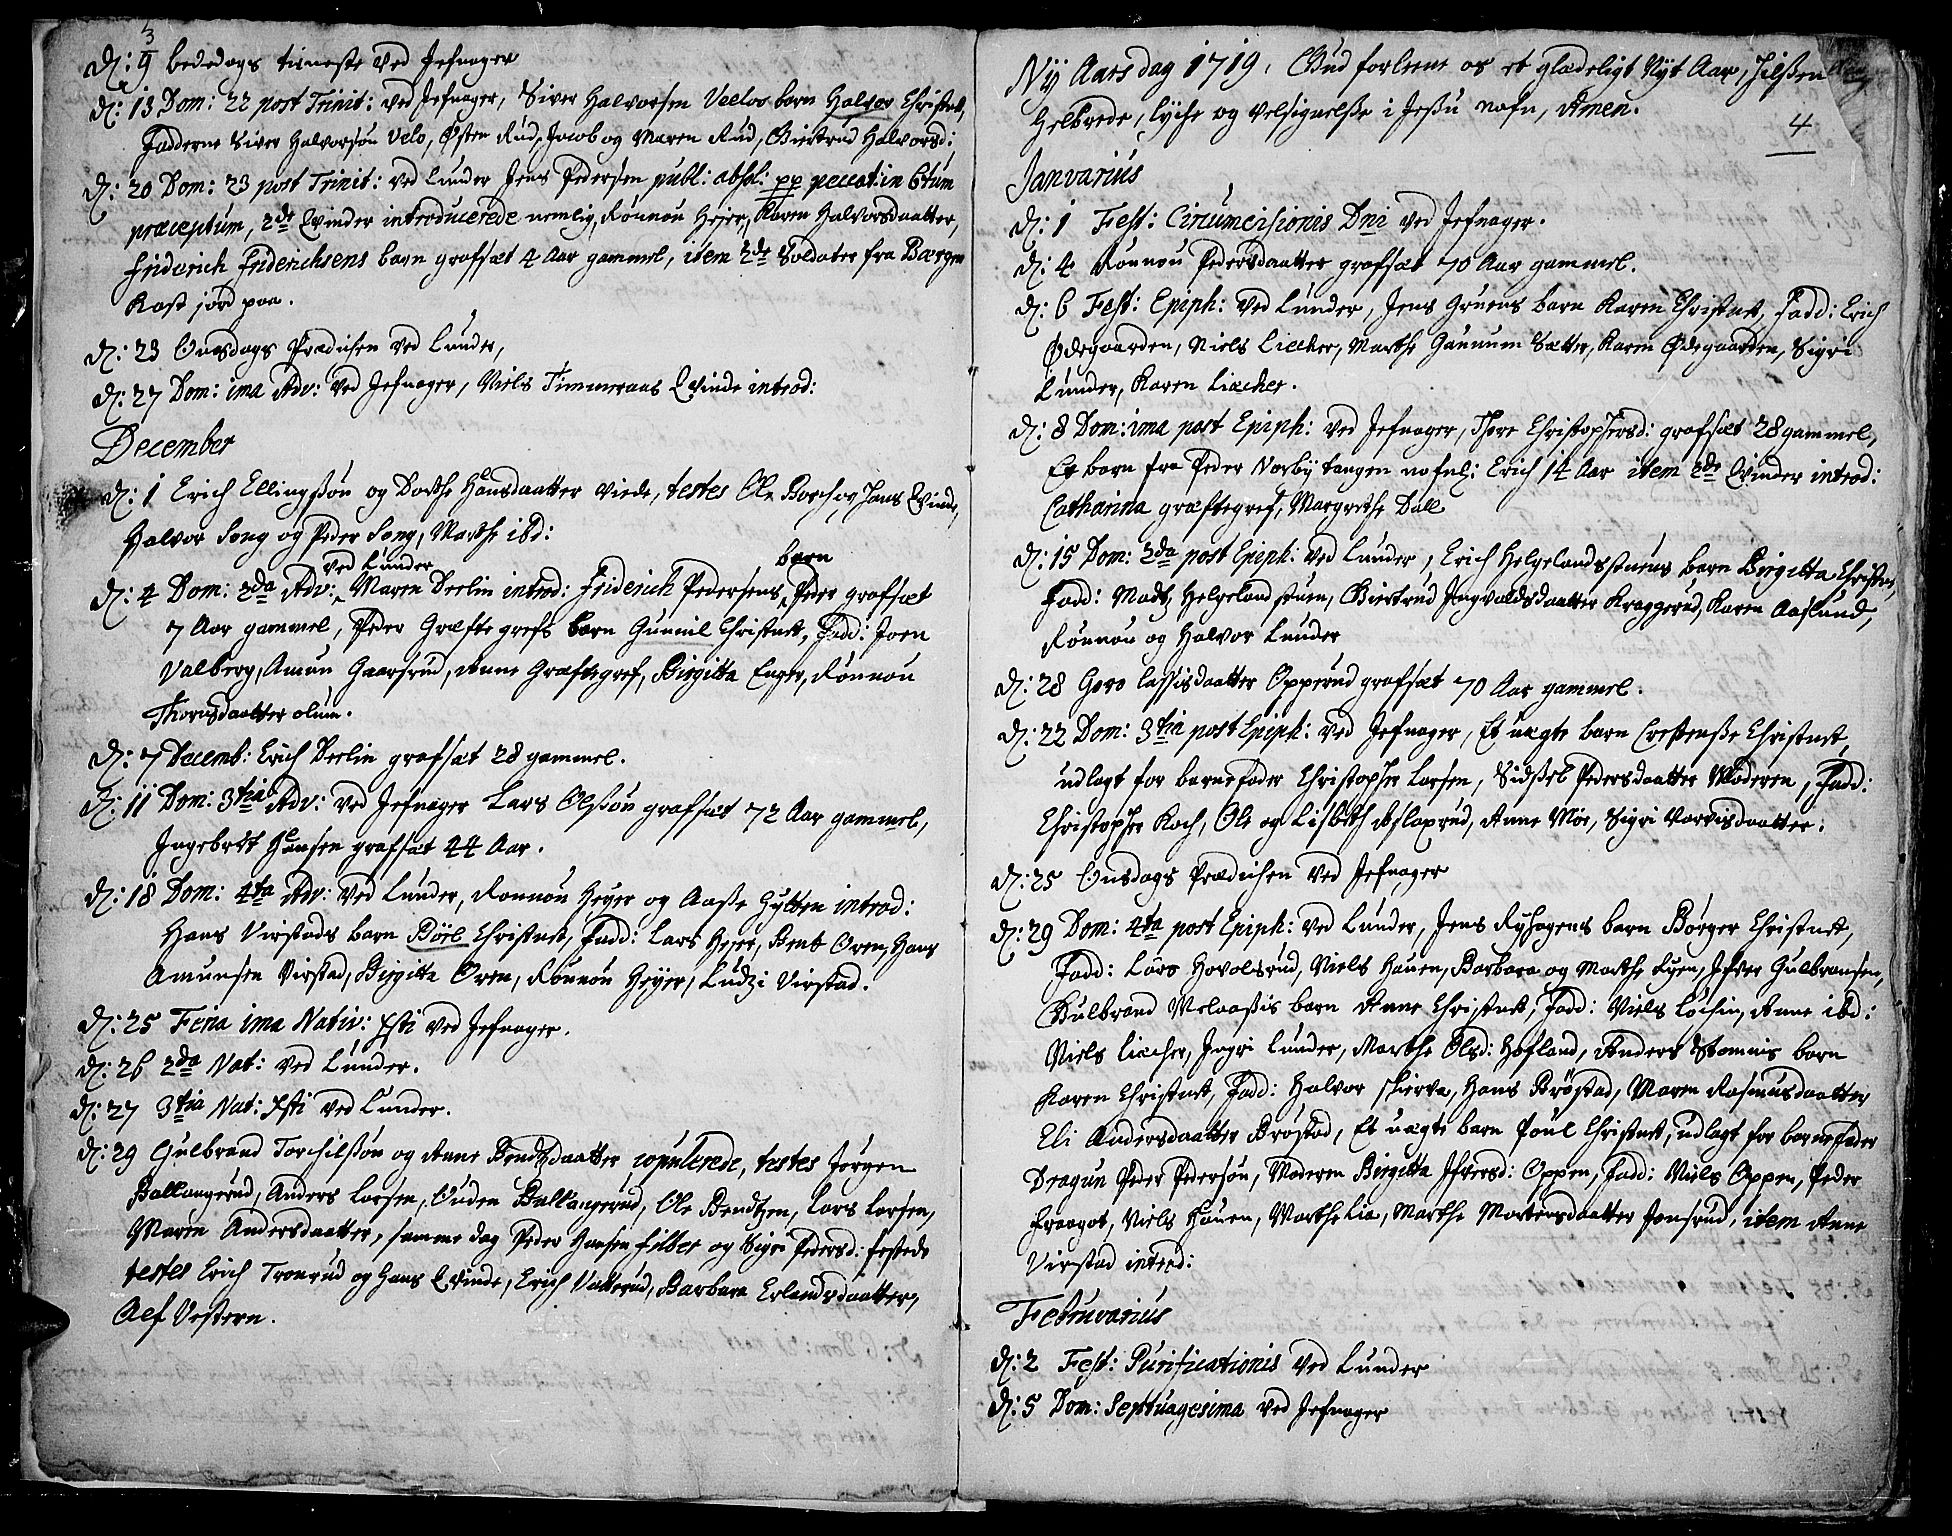 SAH, Jevnaker prestekontor, Ministerialbok nr. 1, 1718-1725, s. 3-4